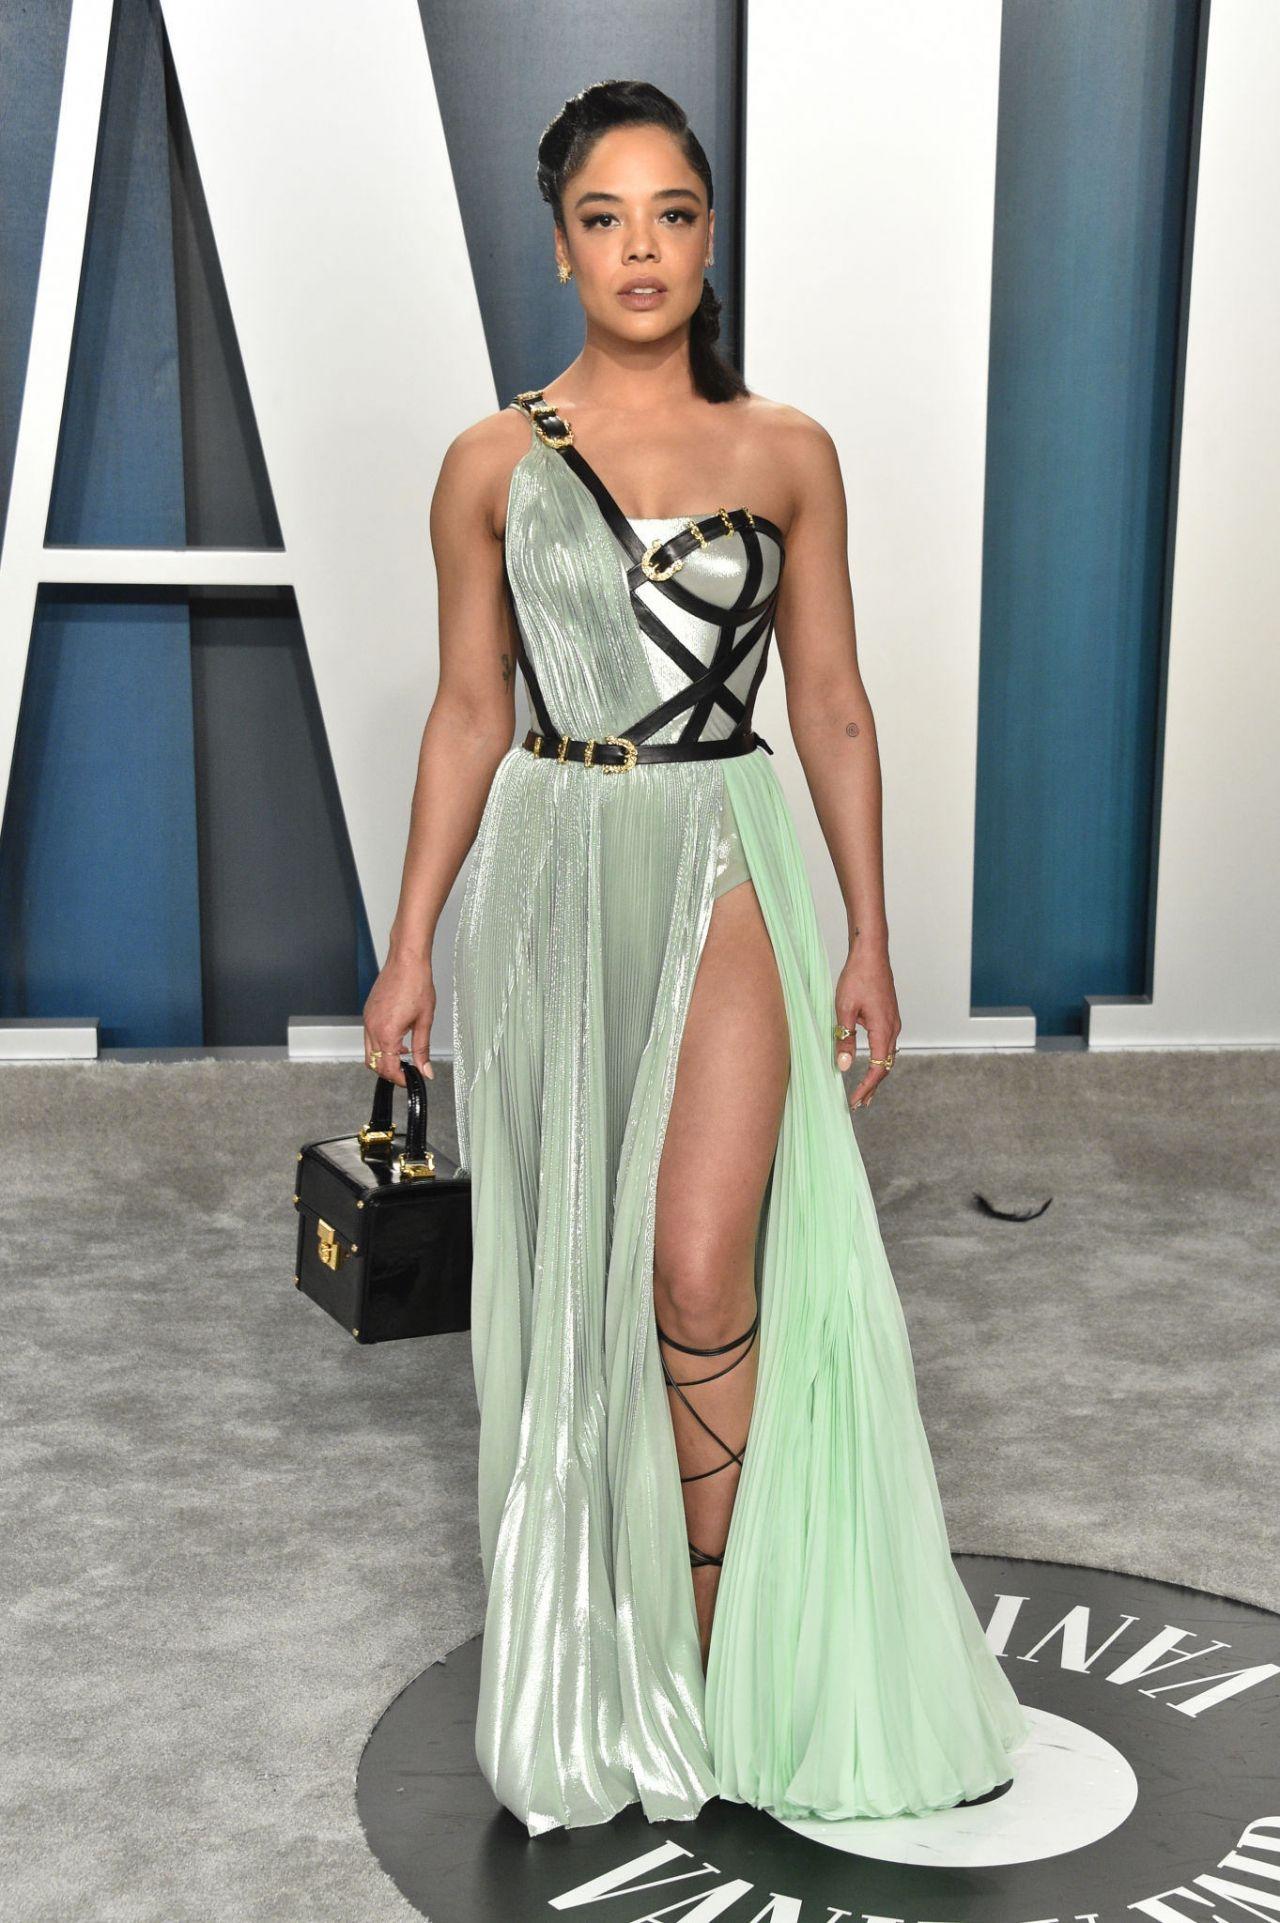 tessa-thompson-in-atelier-versace-2020-vanity-fair-oscar-party